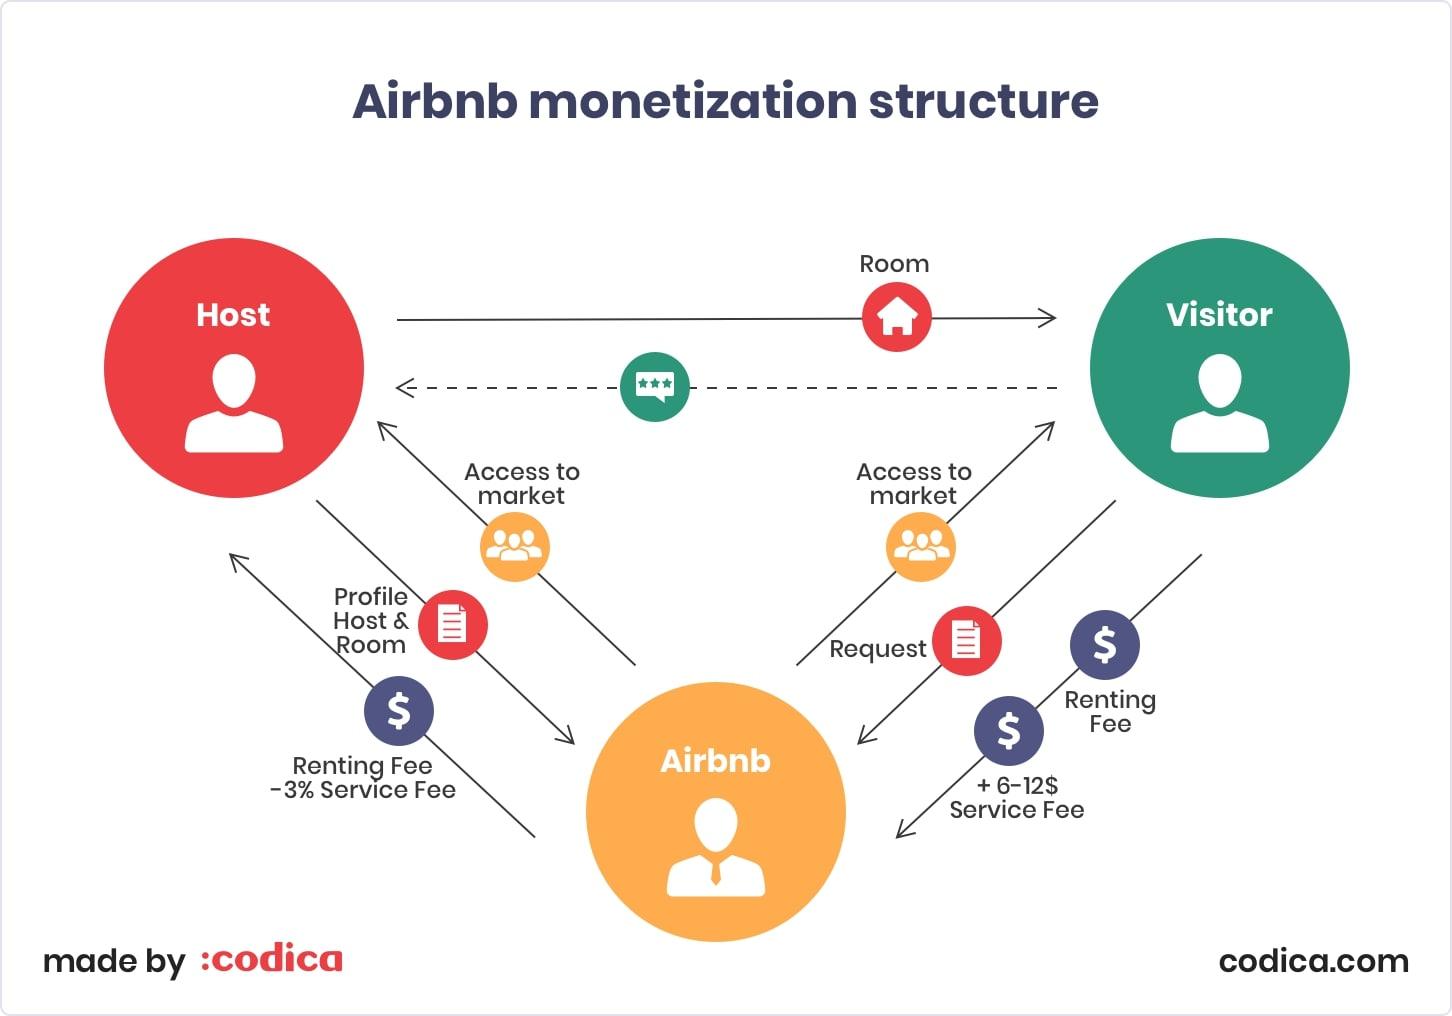 Airbnb monetization structure | Codica